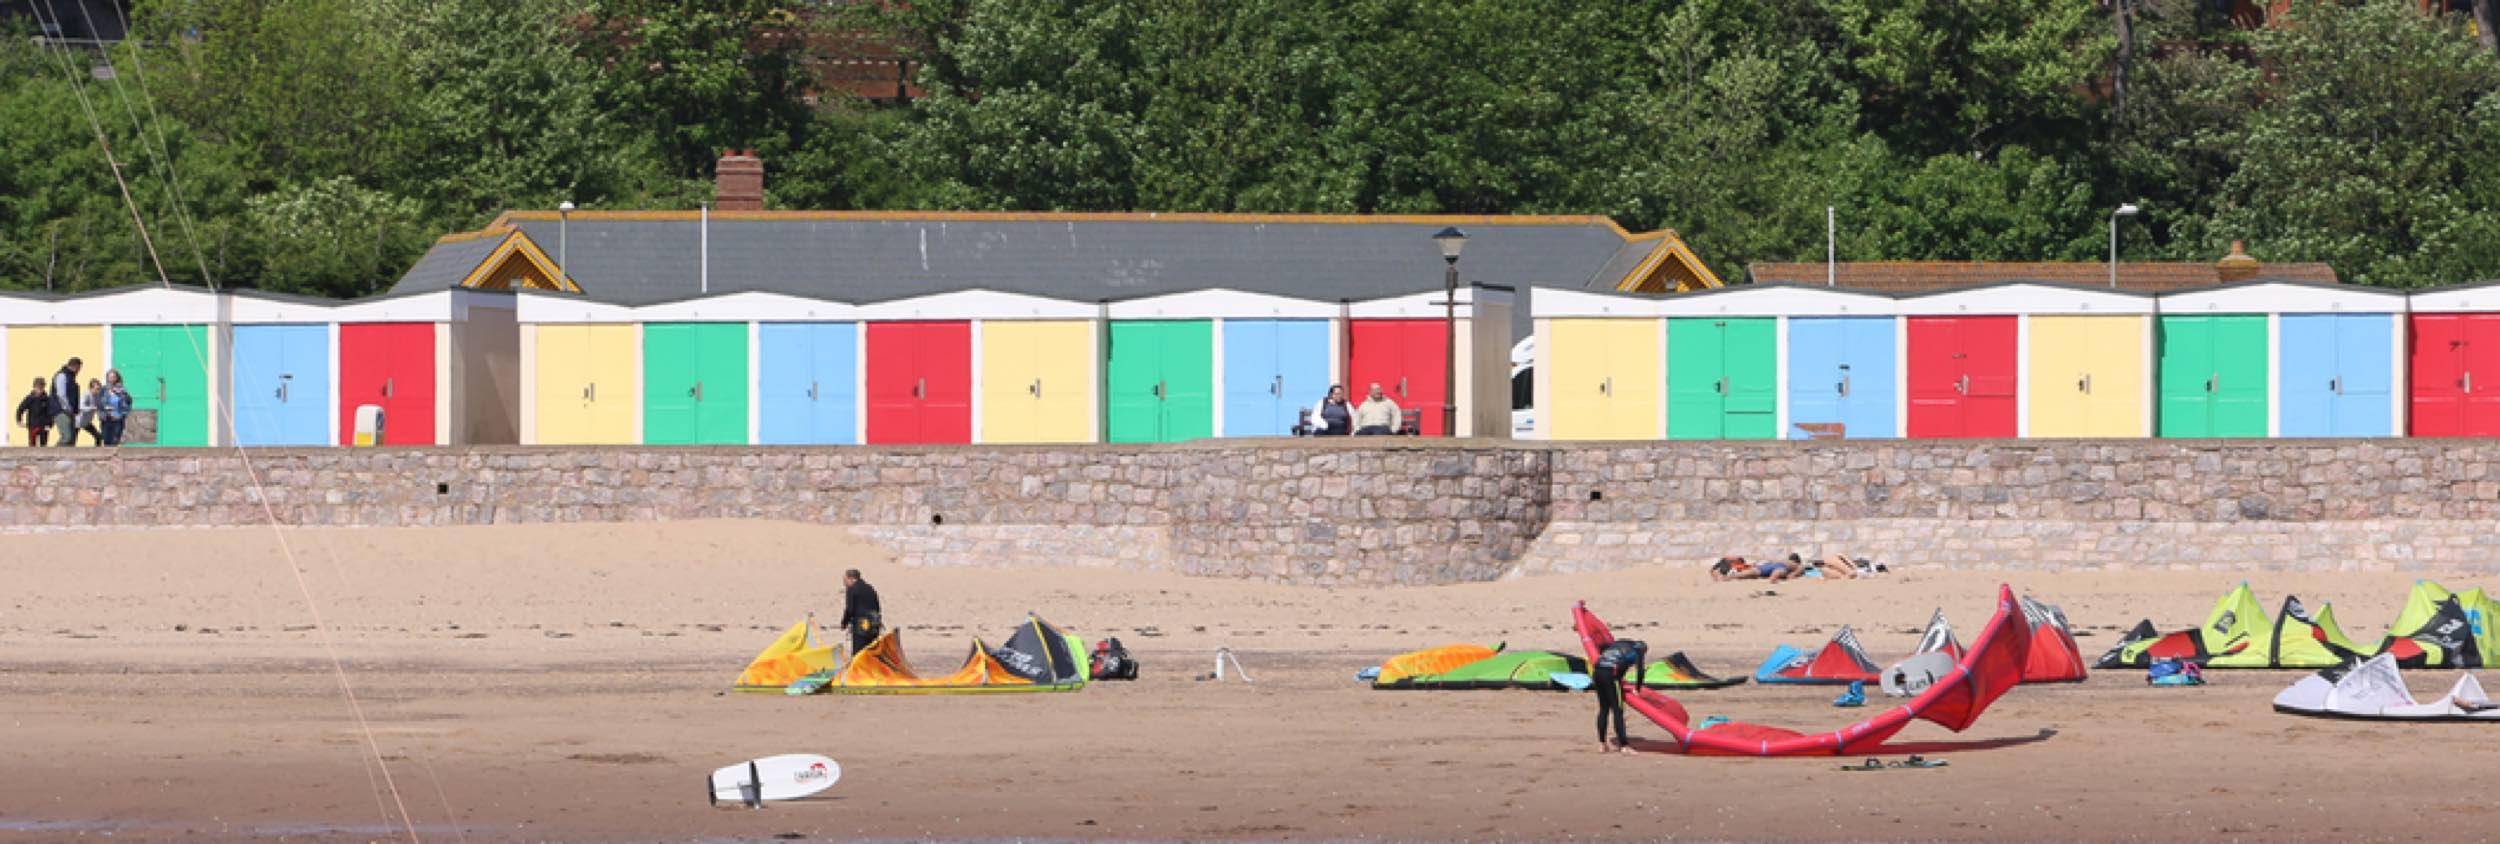 Exmouth kite beach